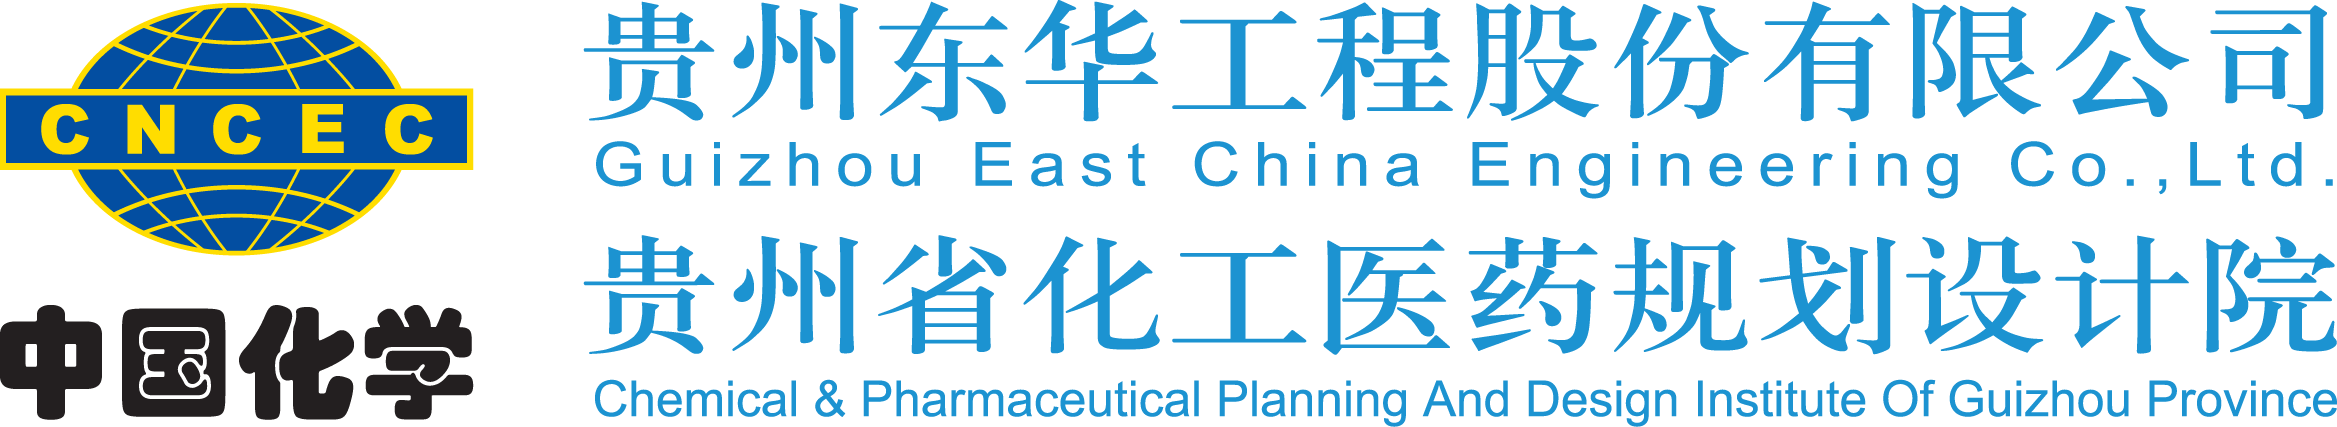 logo-浅蓝